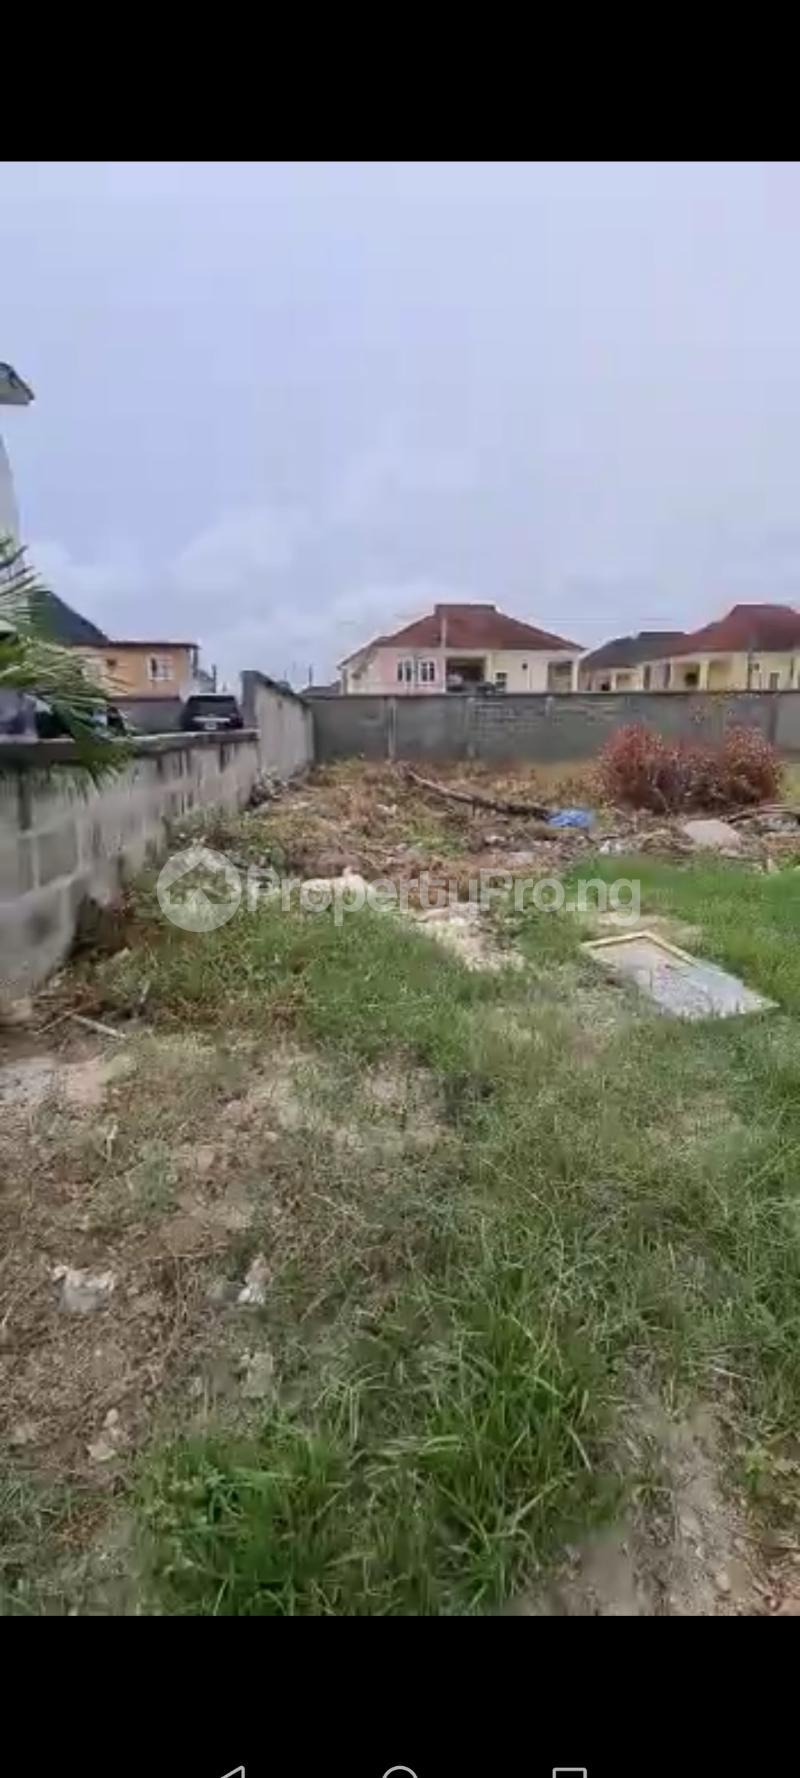 Serviced Residential Land Land for sale Carlton gate estate, chevron drive chevron Lekki Lagos - 1